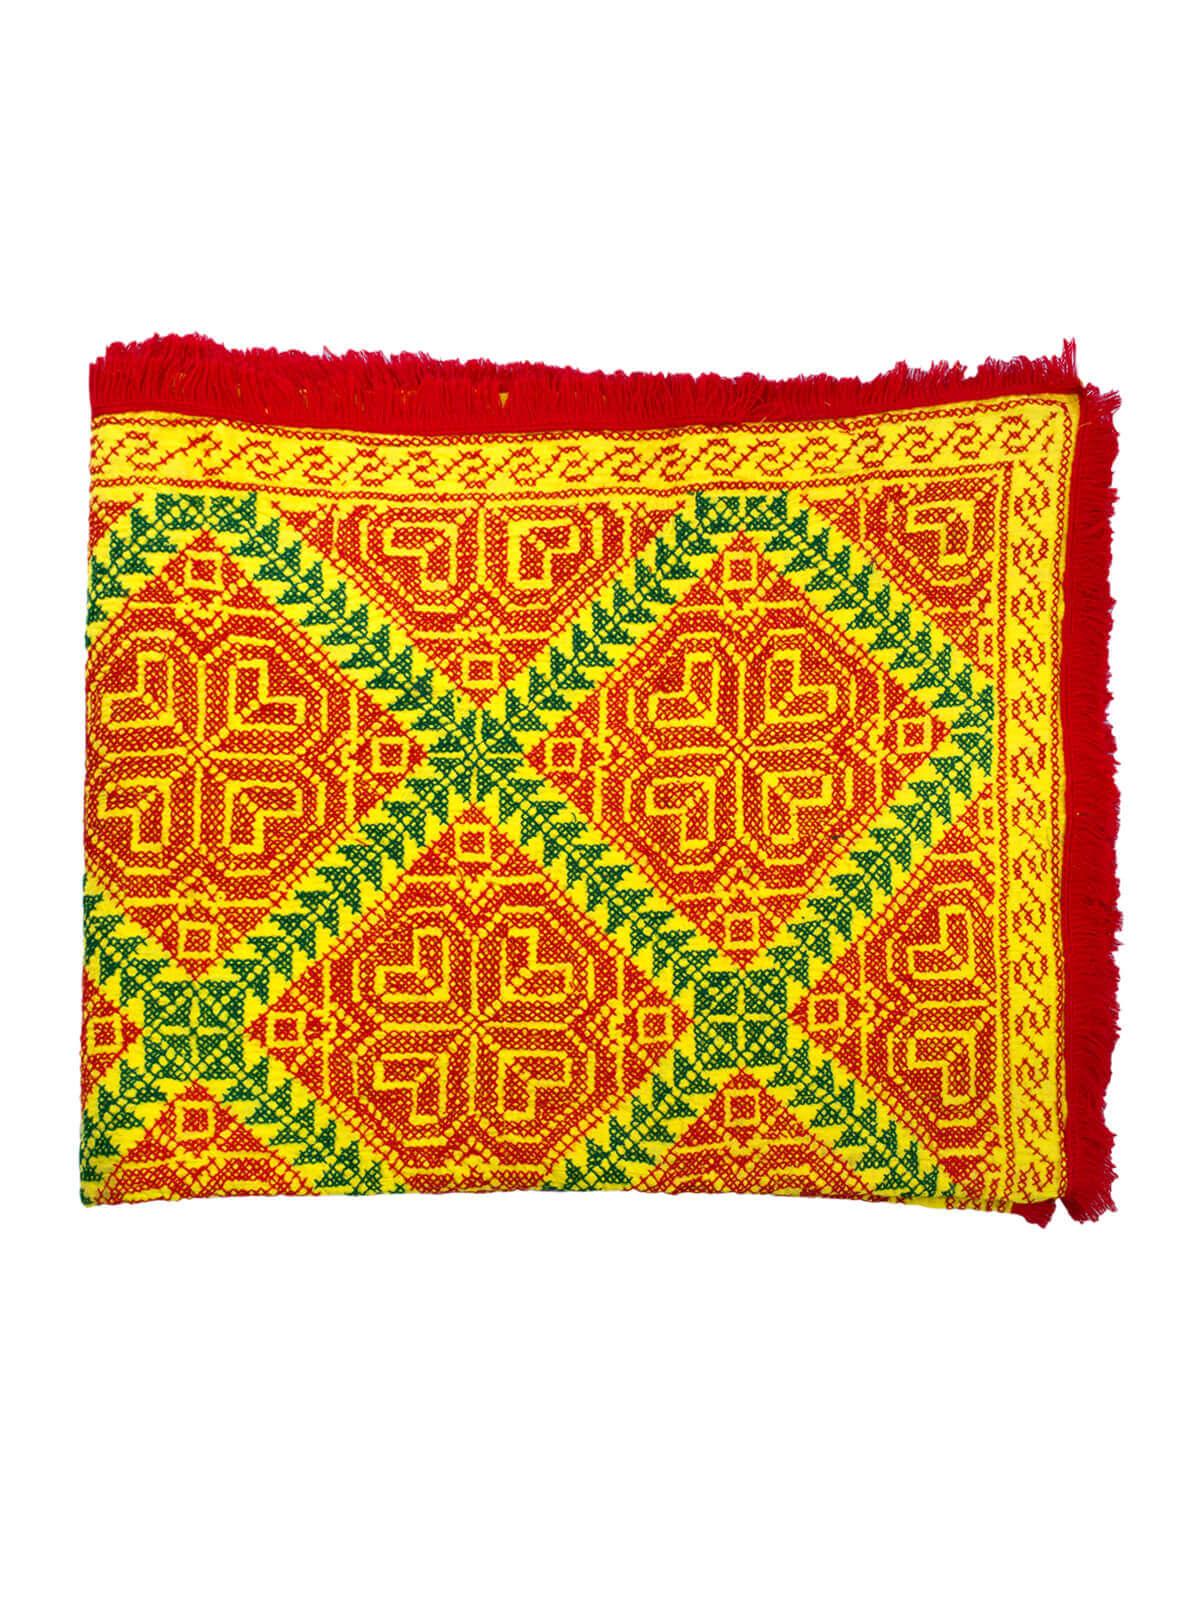 Hand Stitched Nakshi Kantha